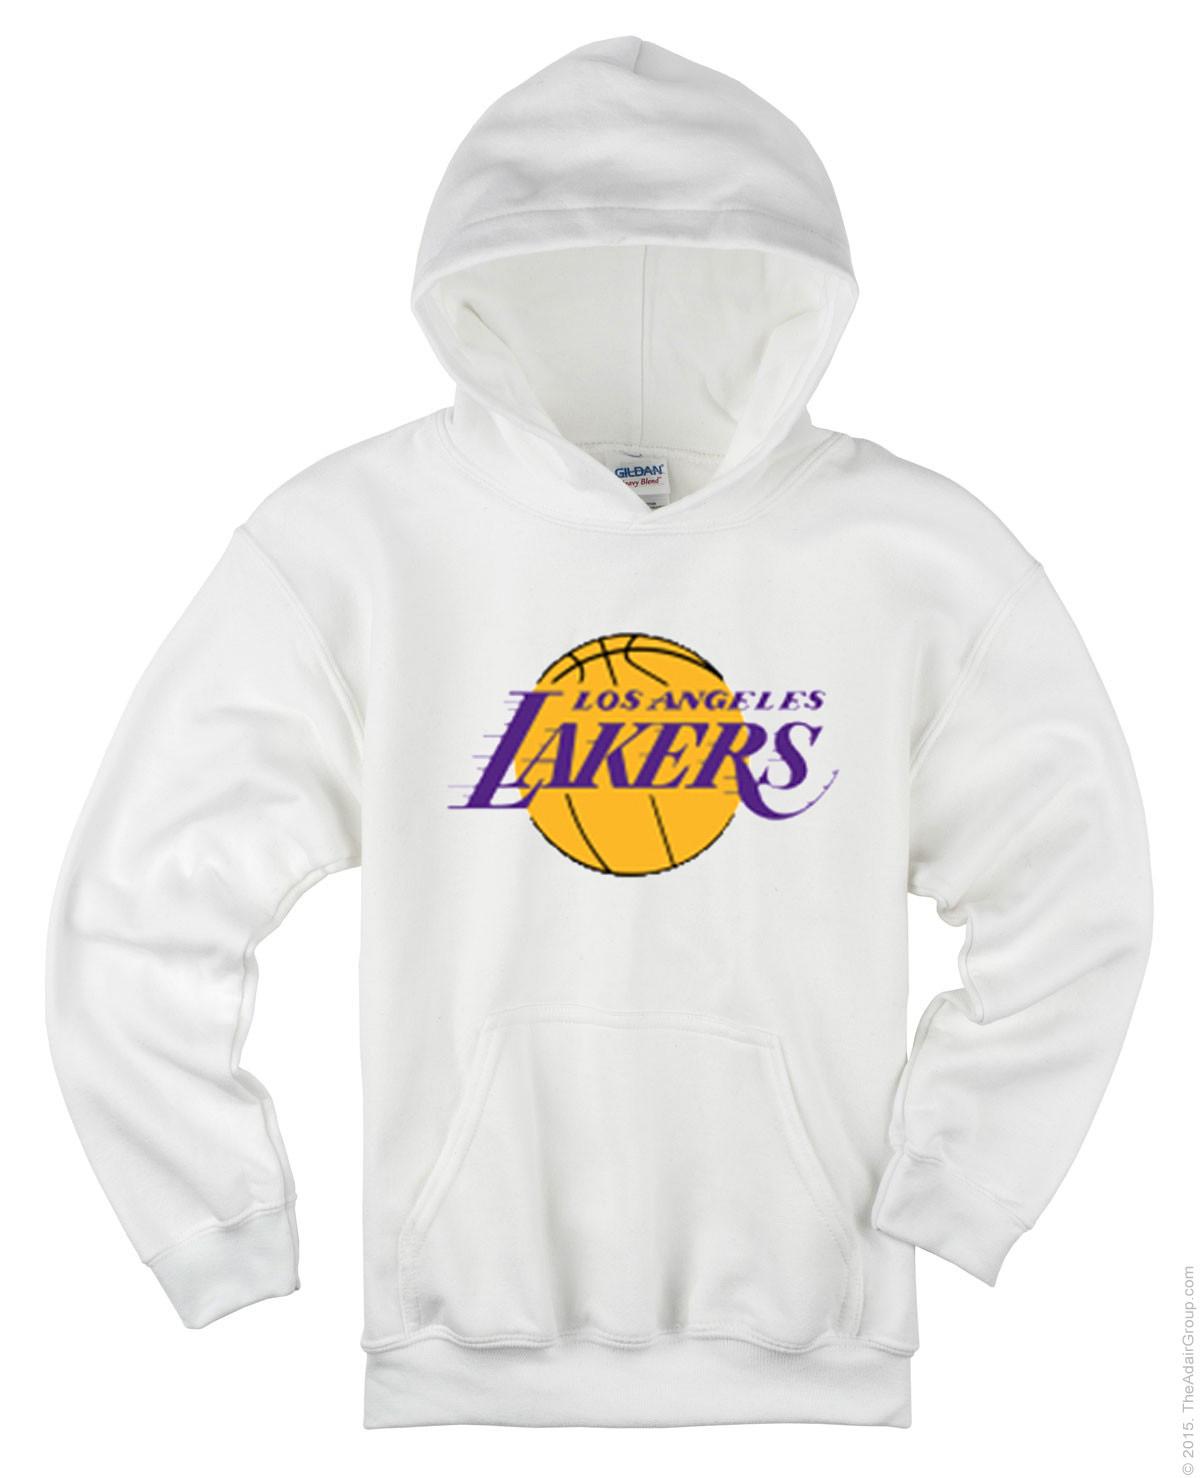 b82b3f372 Los Angeles Lakers Hoodie pullover - donefashion.com